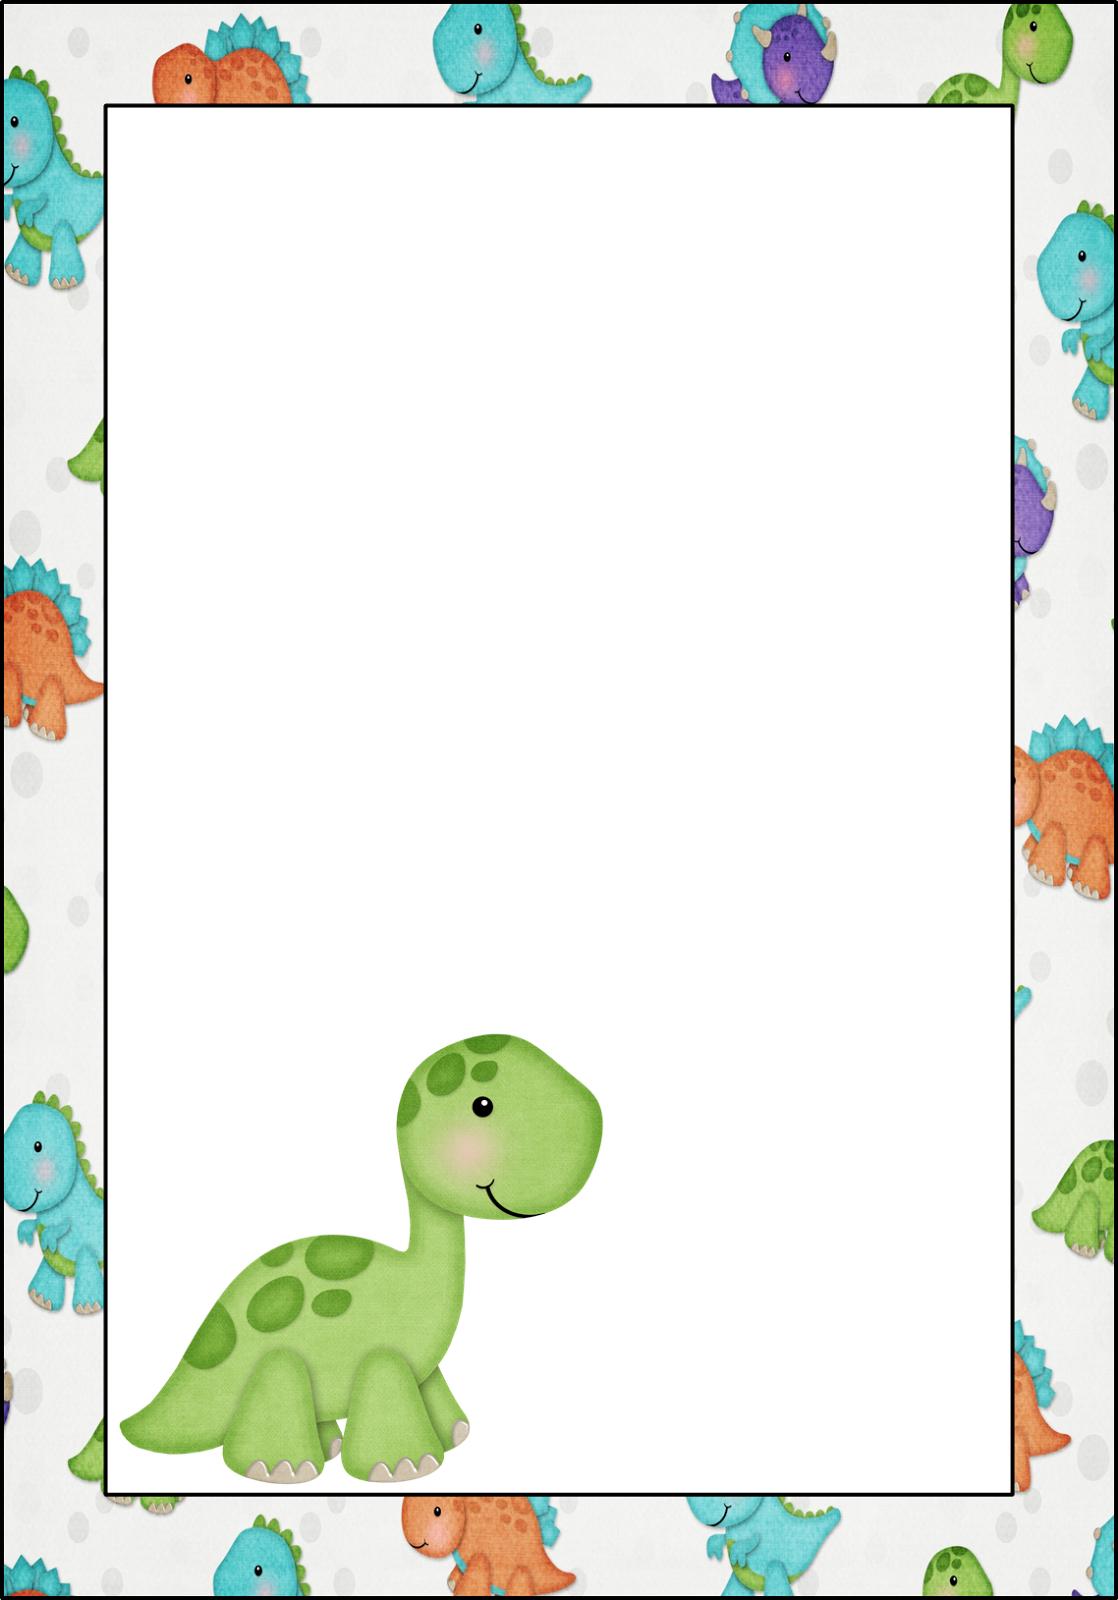 Dinosaur: Free Printable Frames, Invitations, Cards Or Labels - Free Printable Dinosaur Baby Shower Invitations